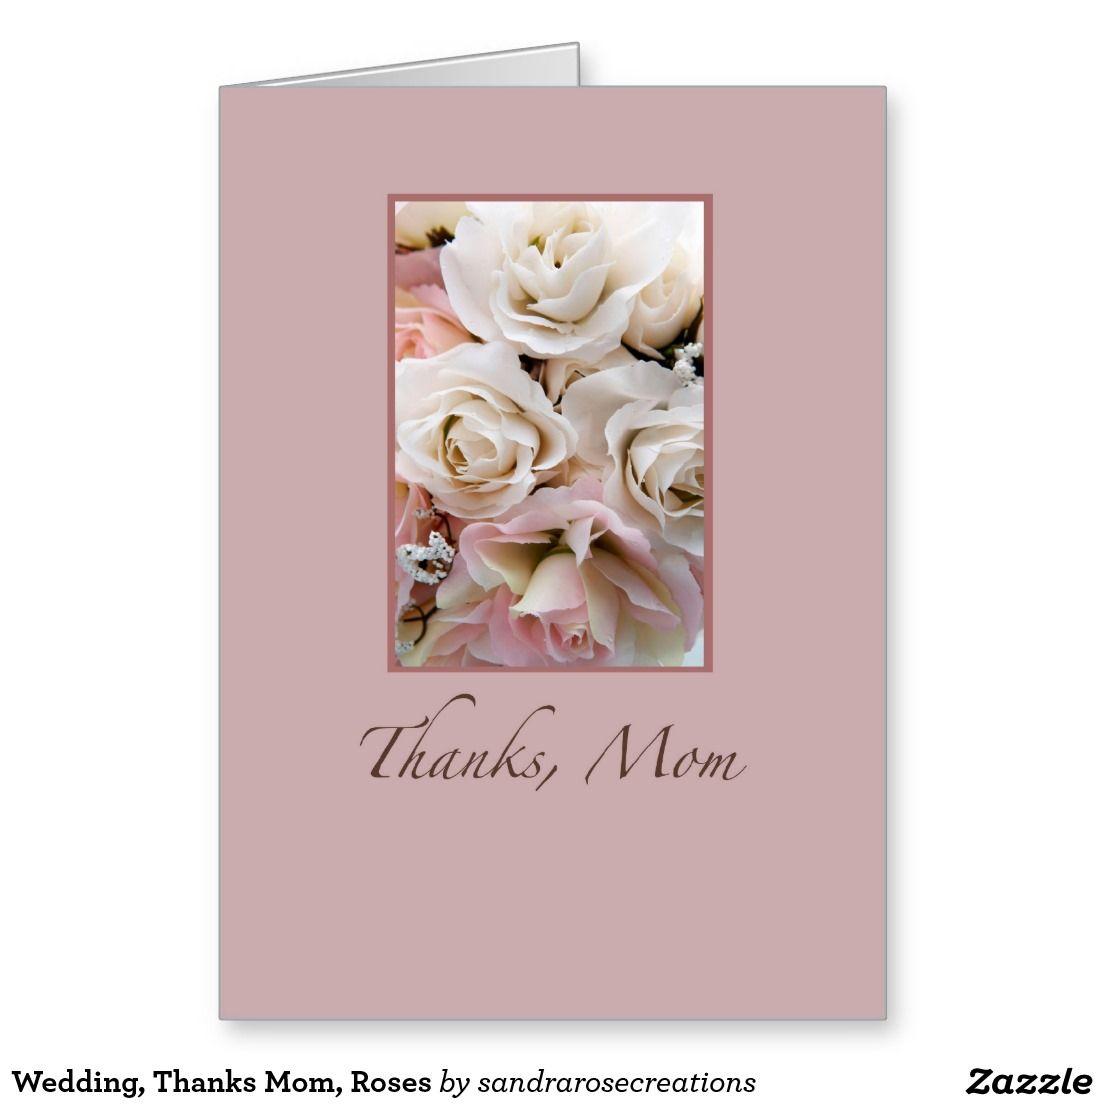 Wedding thanks mom roses greeting card wedding connection wedding thanks mom roses greeting card kristyandbryce Images